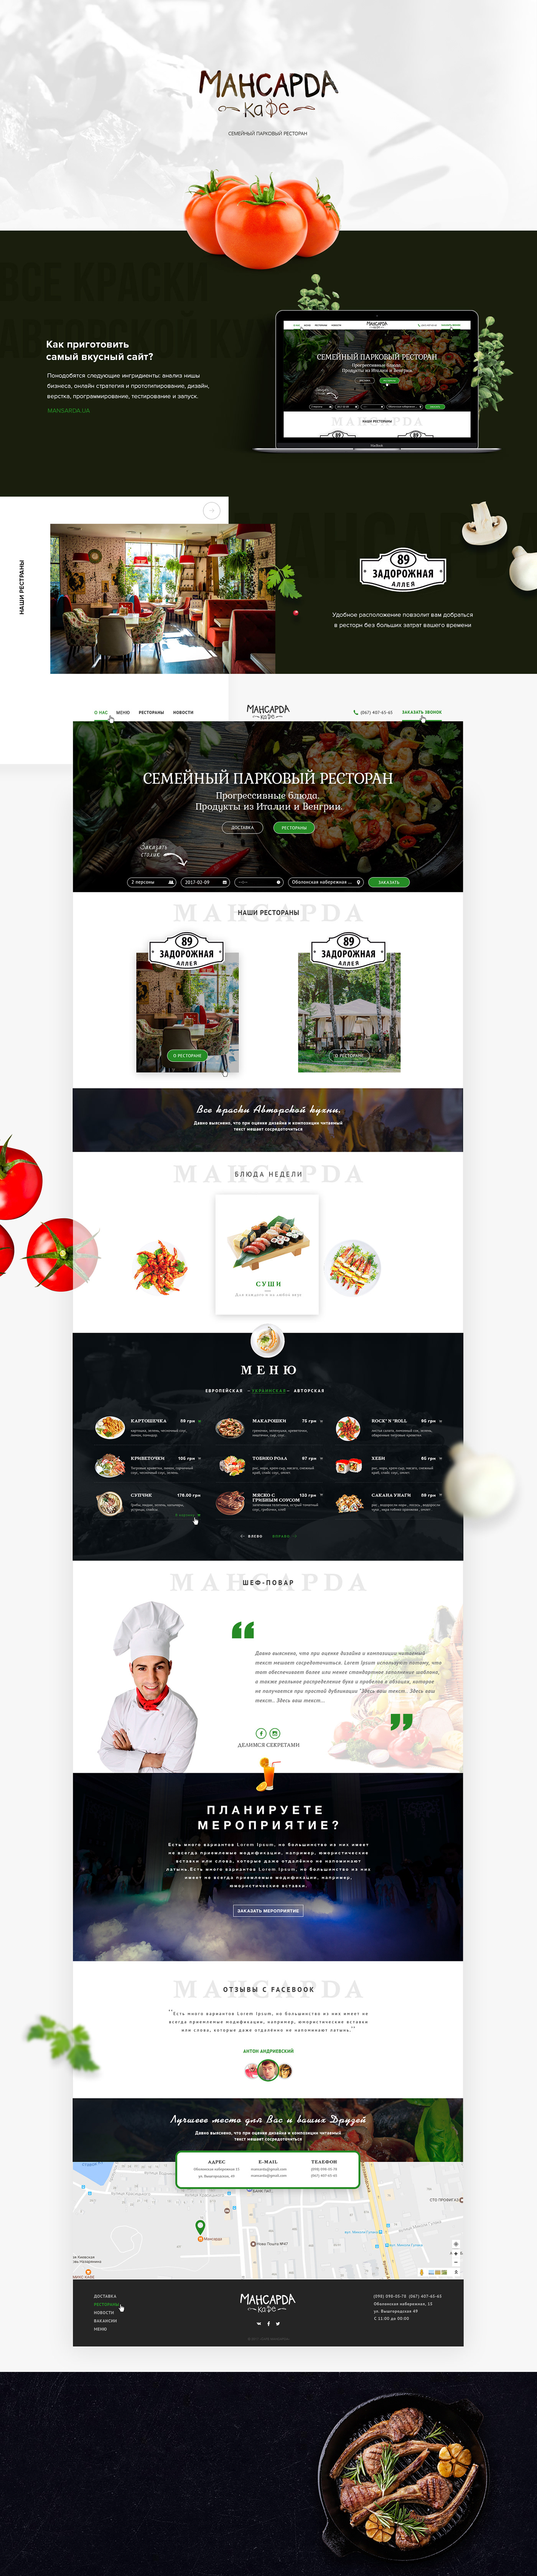 cafe wsf web solutions factory design ux UI Project mansarda Web